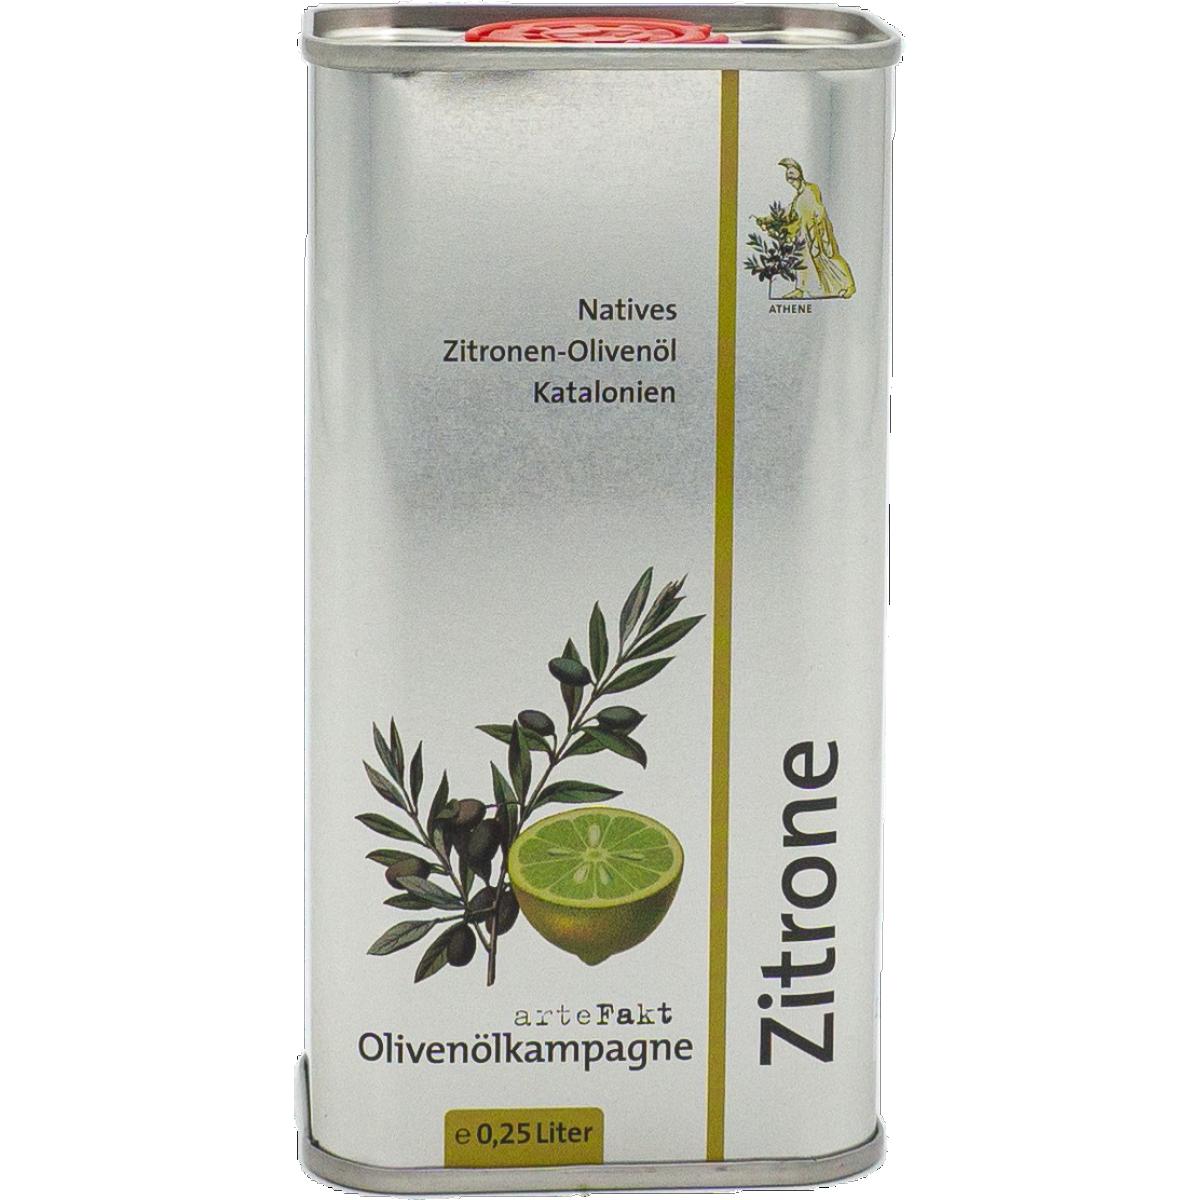 Bio Zitronen-Olivenöl; nativ